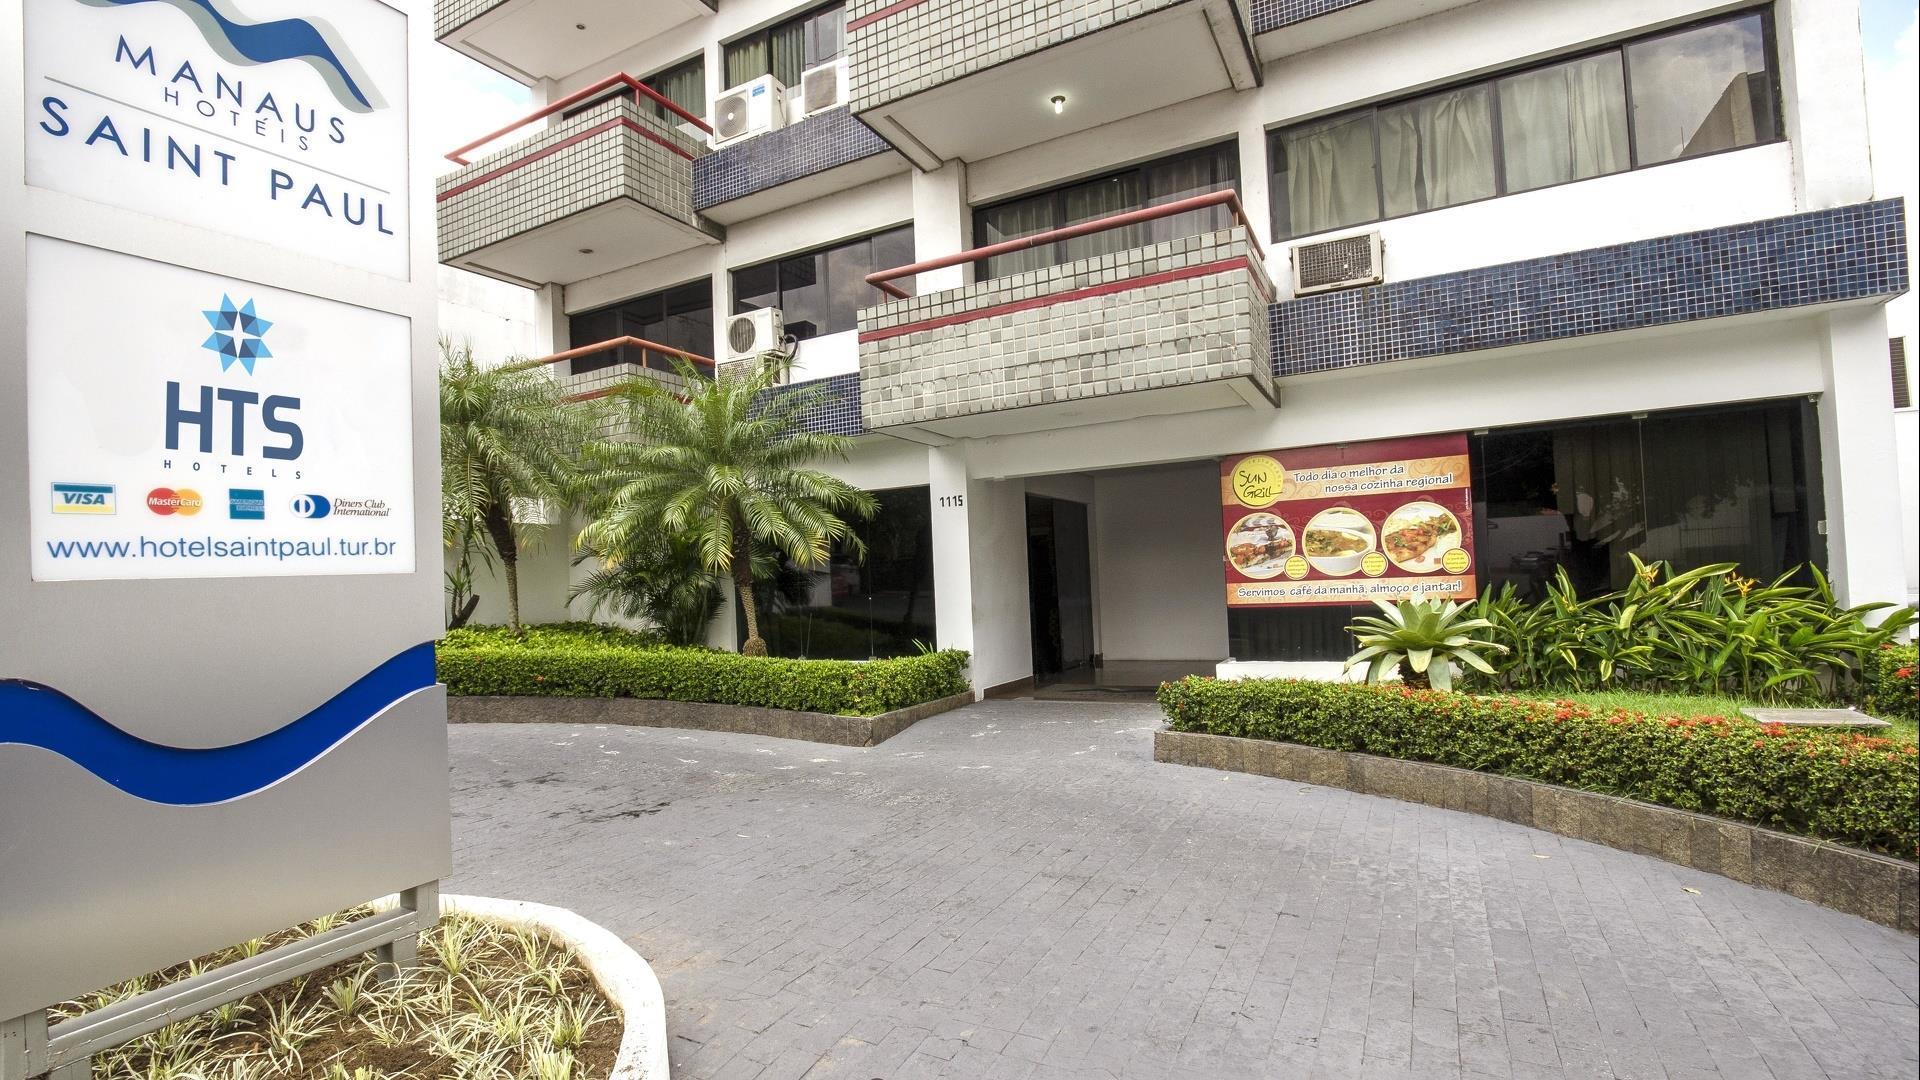 Brasilien Manaus: Standard Hotel - Hotel Saint Paul